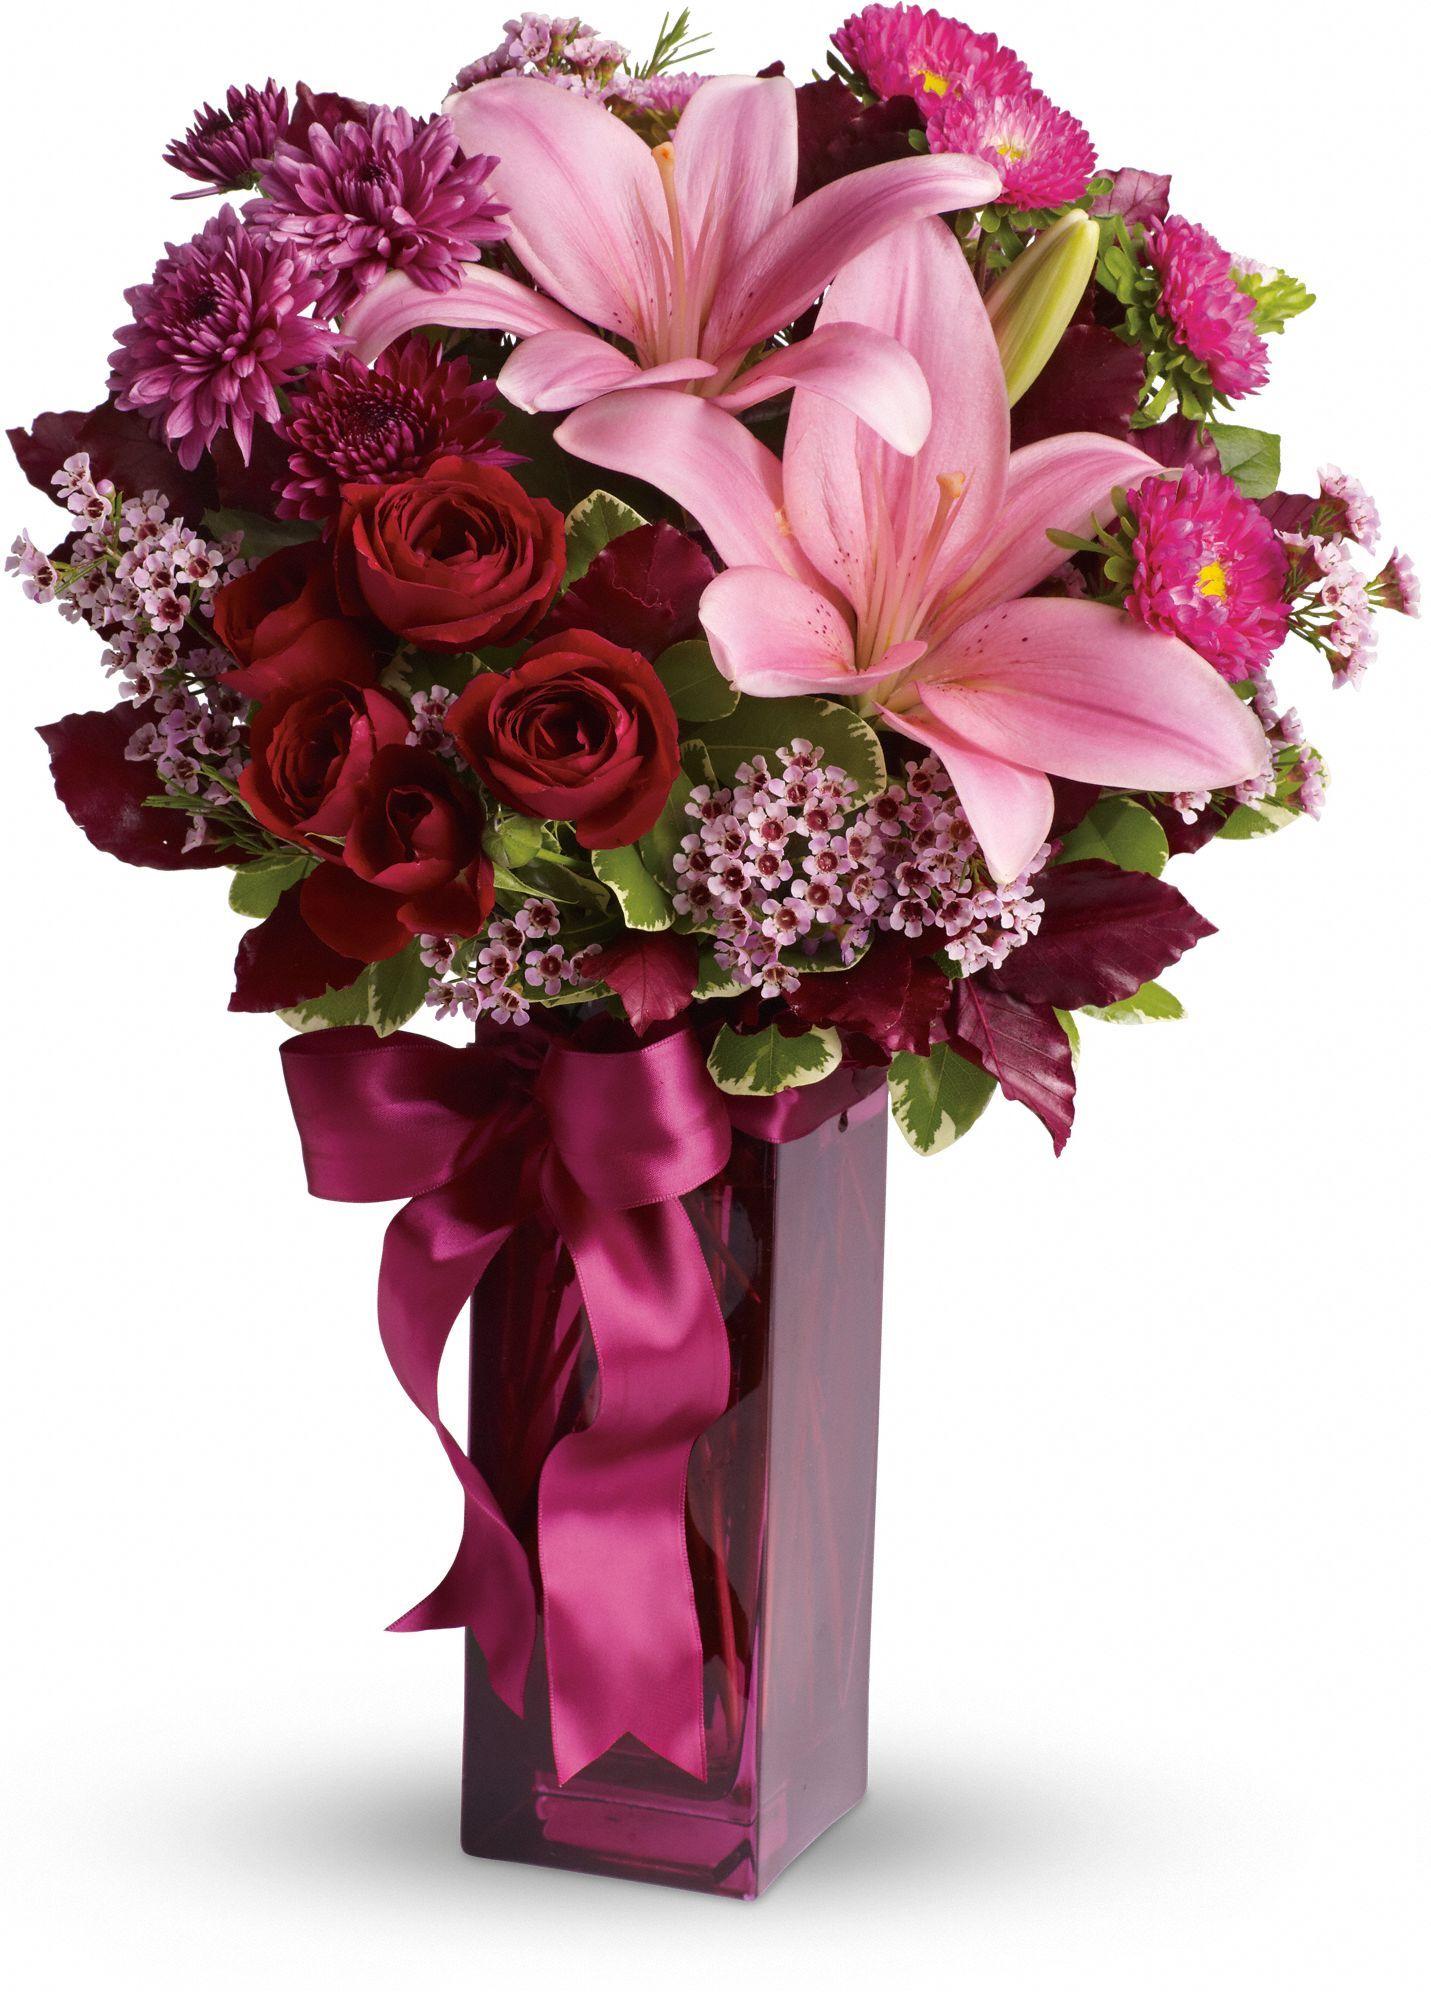 Sears flowers telefloras fall in love for valentine days 3 sears flowers telefloras fall in love for valentine izmirmasajfo Choice Image